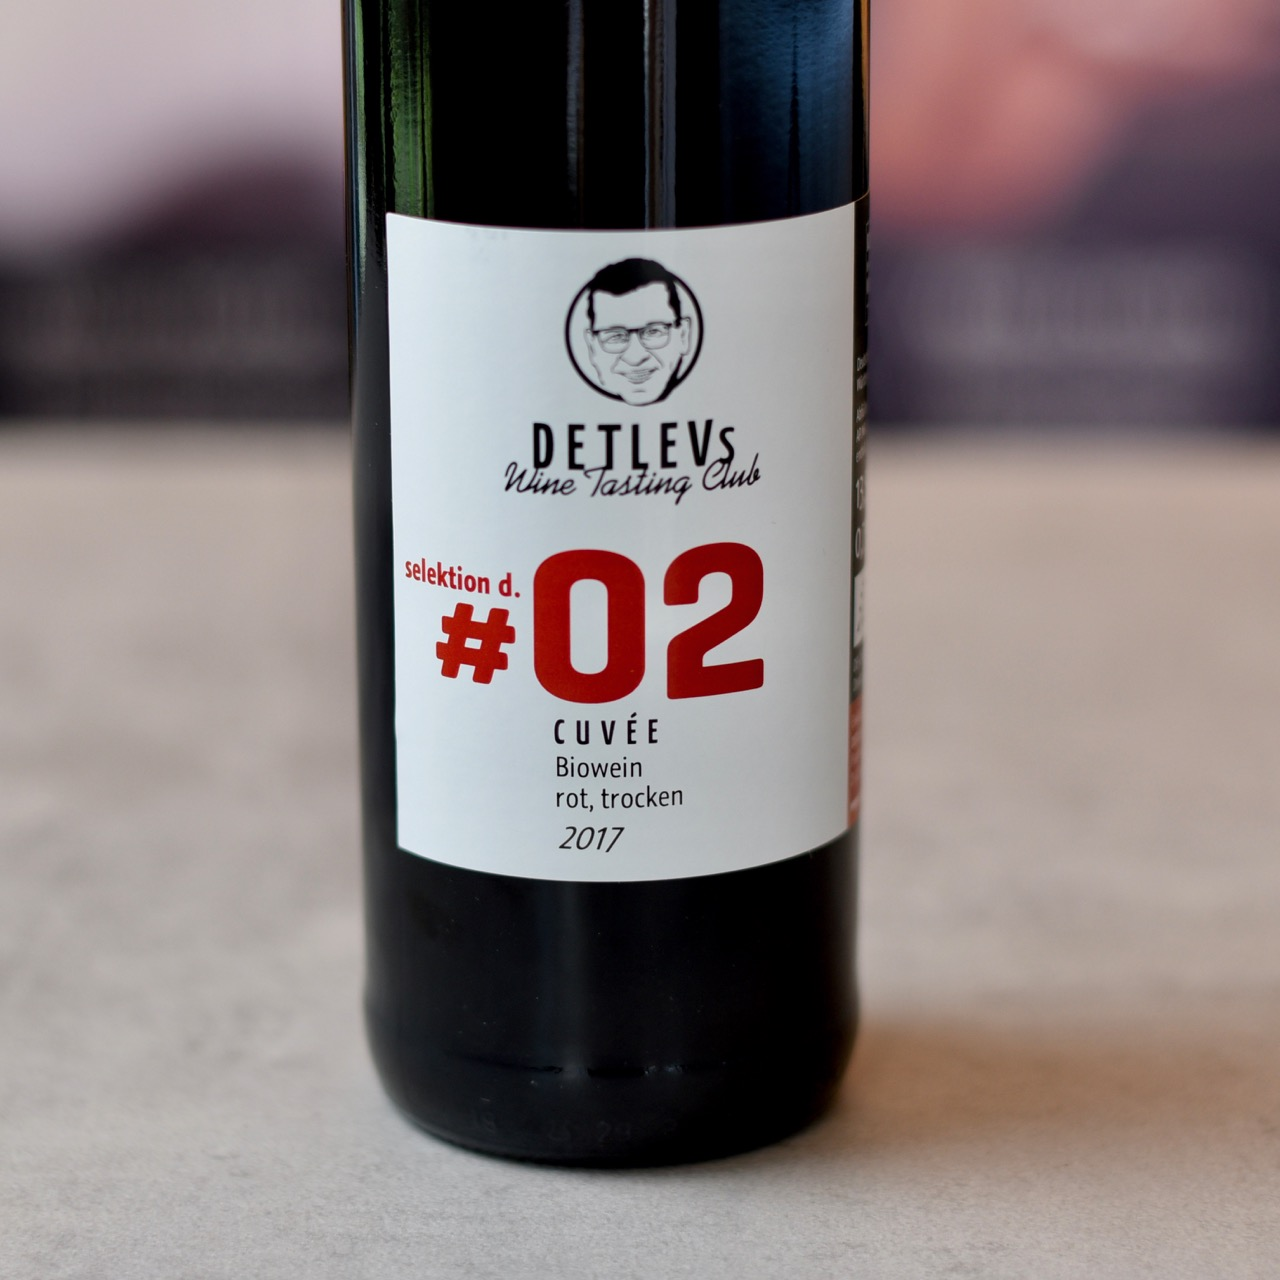 "DETLEVs ""selektion d."" No. 02 Spätb., Cabernet, Lemb. Cuvee rot, 2017, bio"